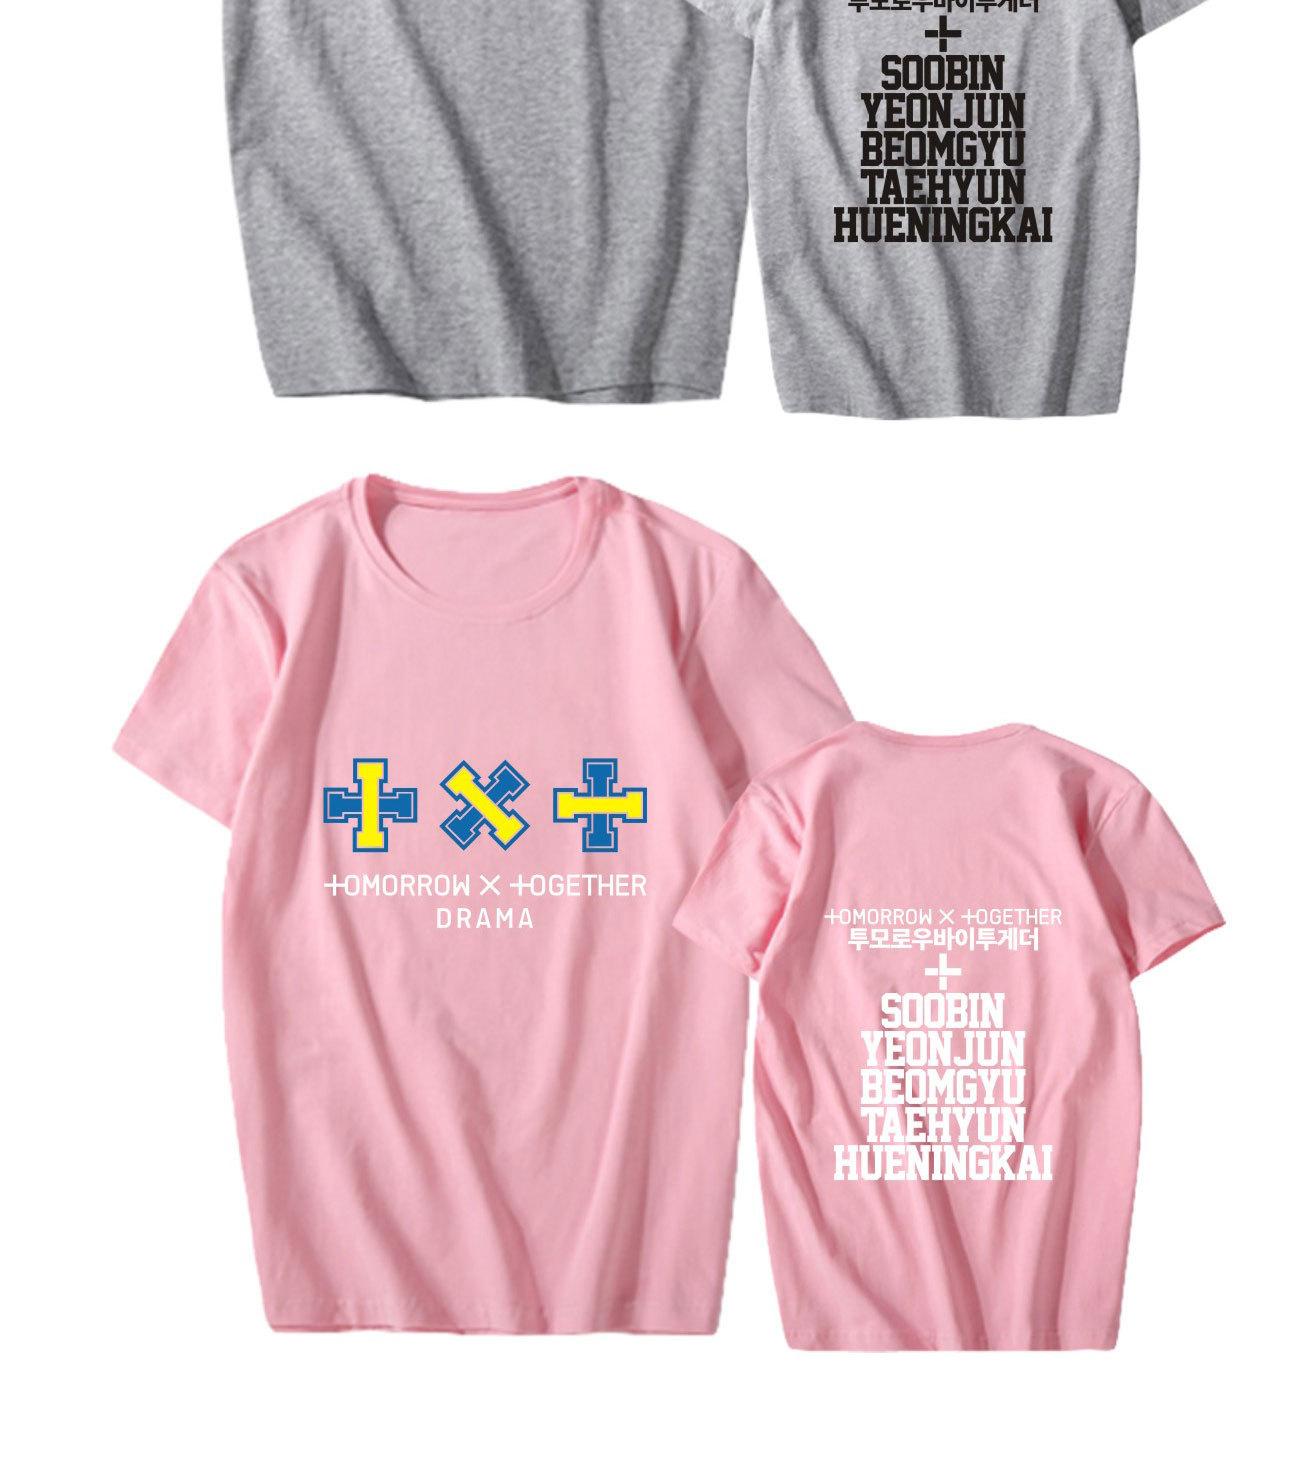 TXT DRAMA T-shirt